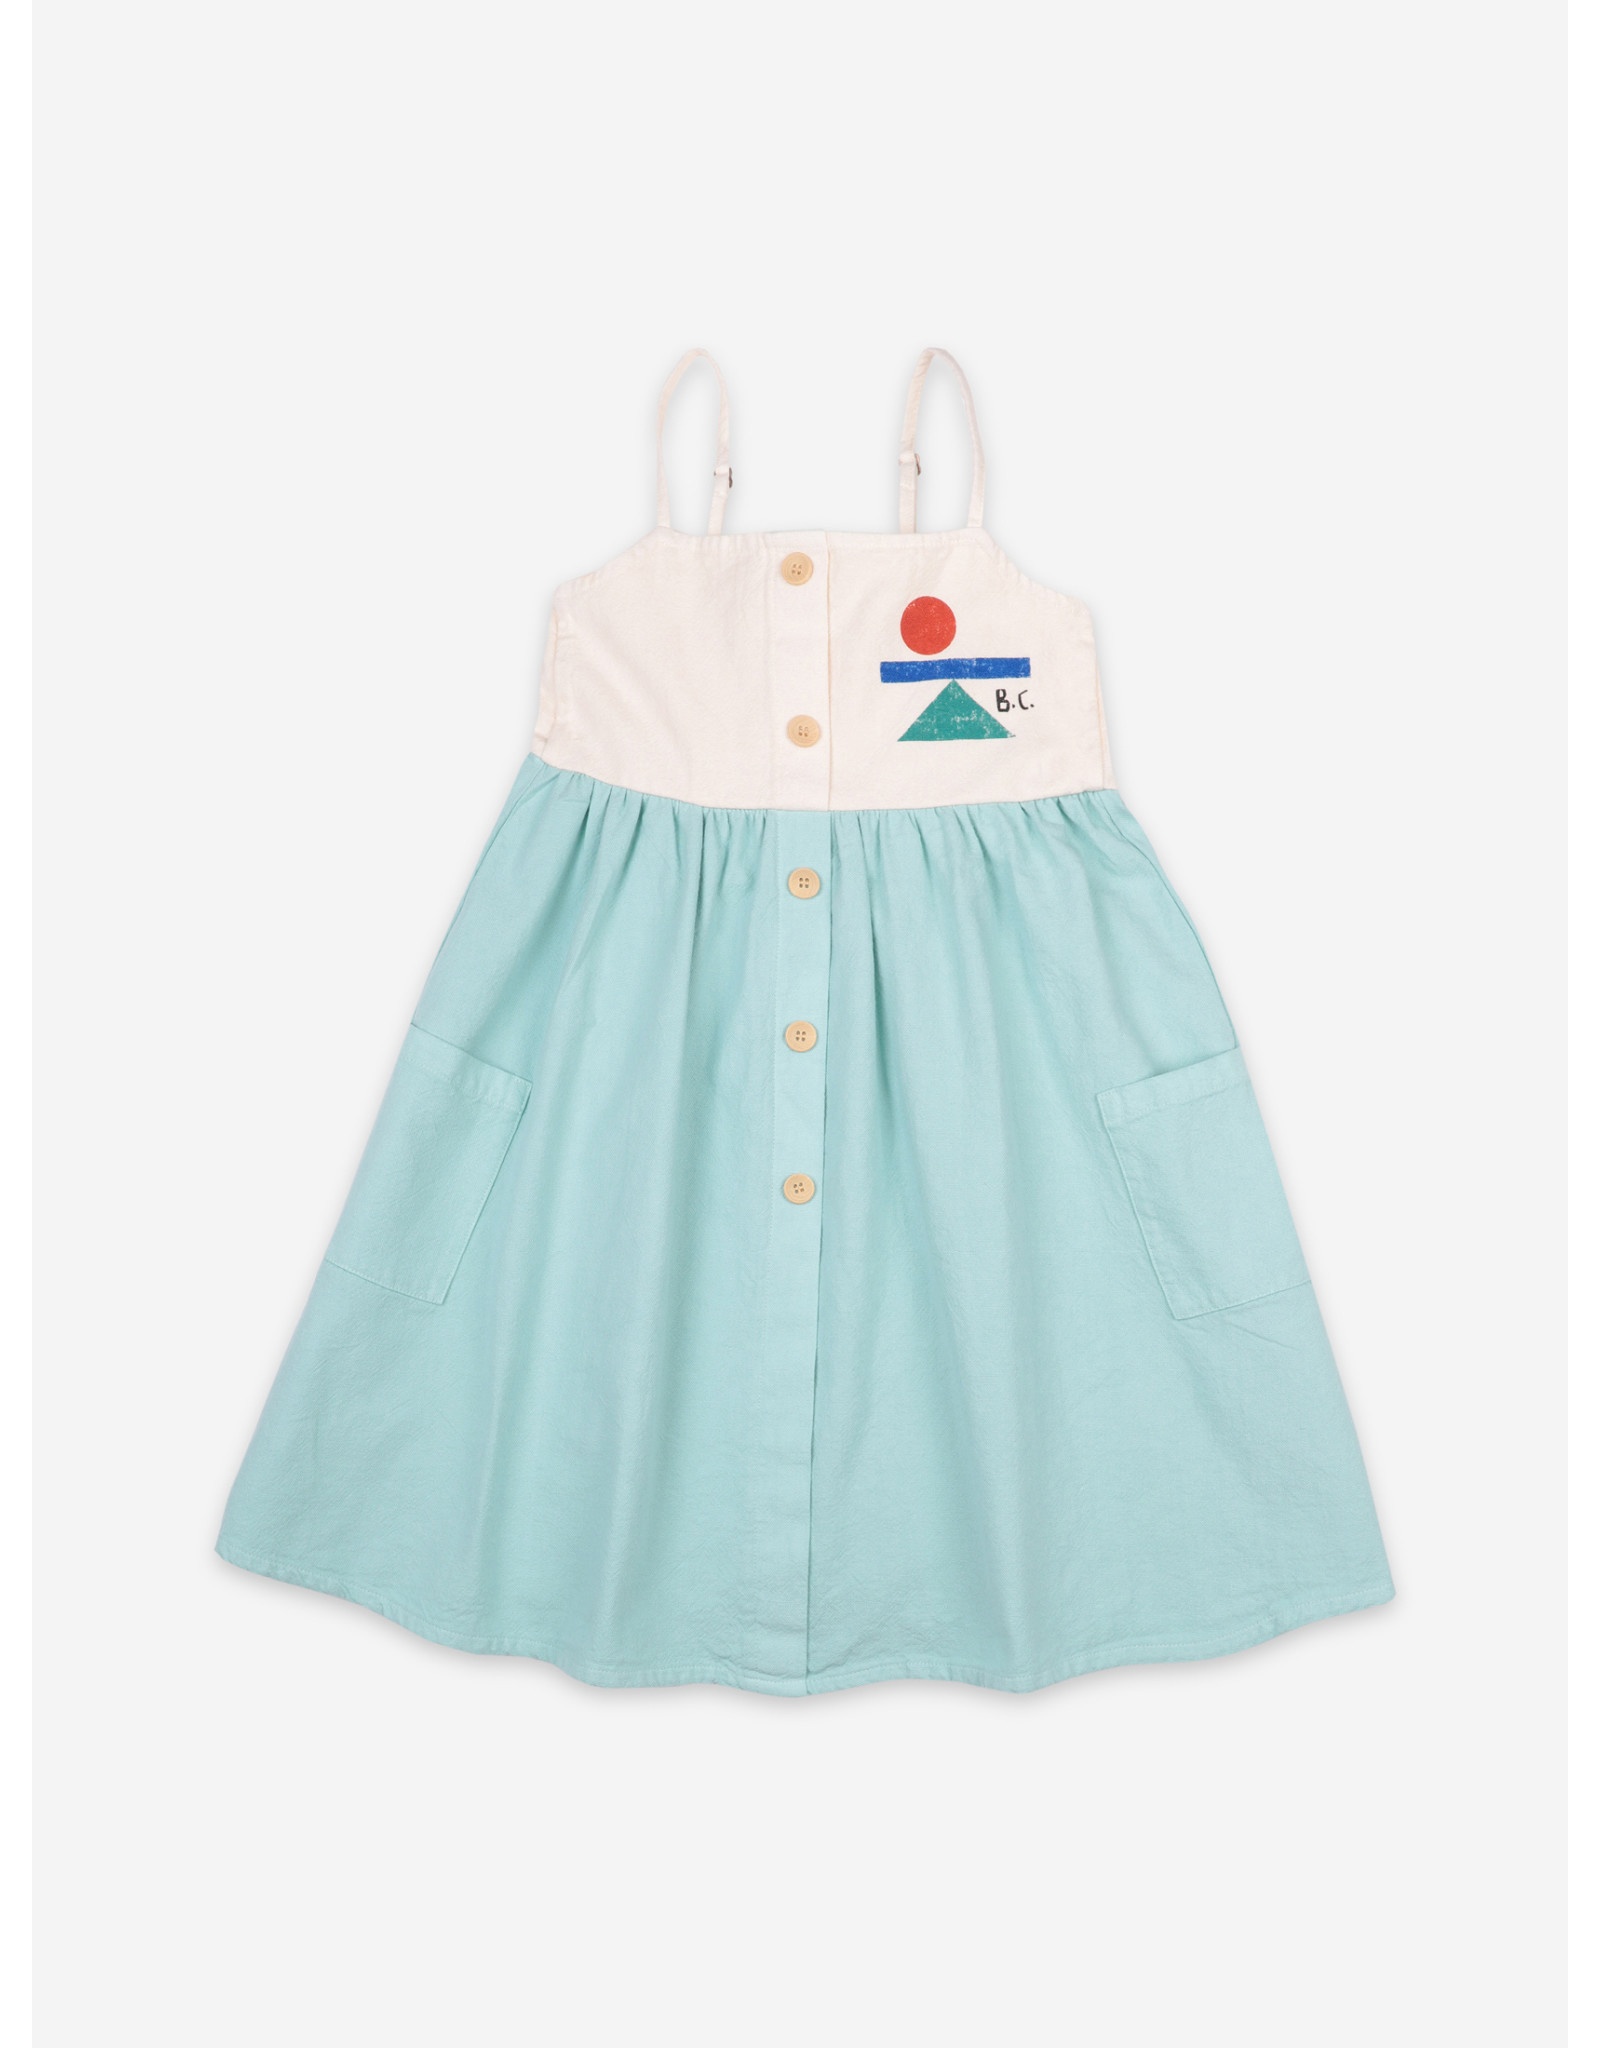 Bobo Choses Bobo Choses Balance Woven Dress